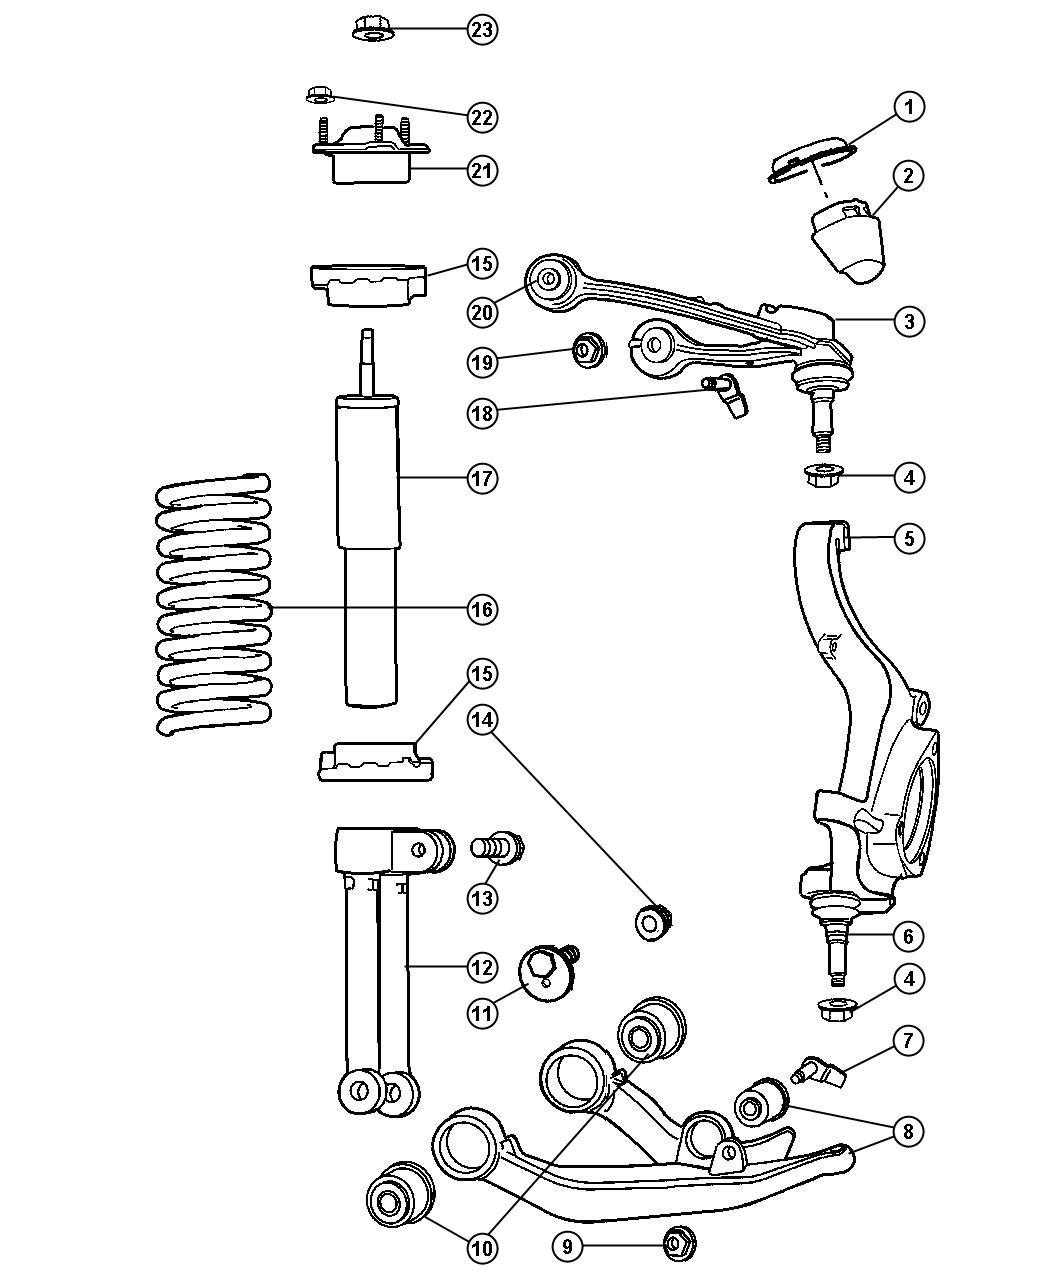 Dodge Nitro Shock absorber package. Suspension. Front